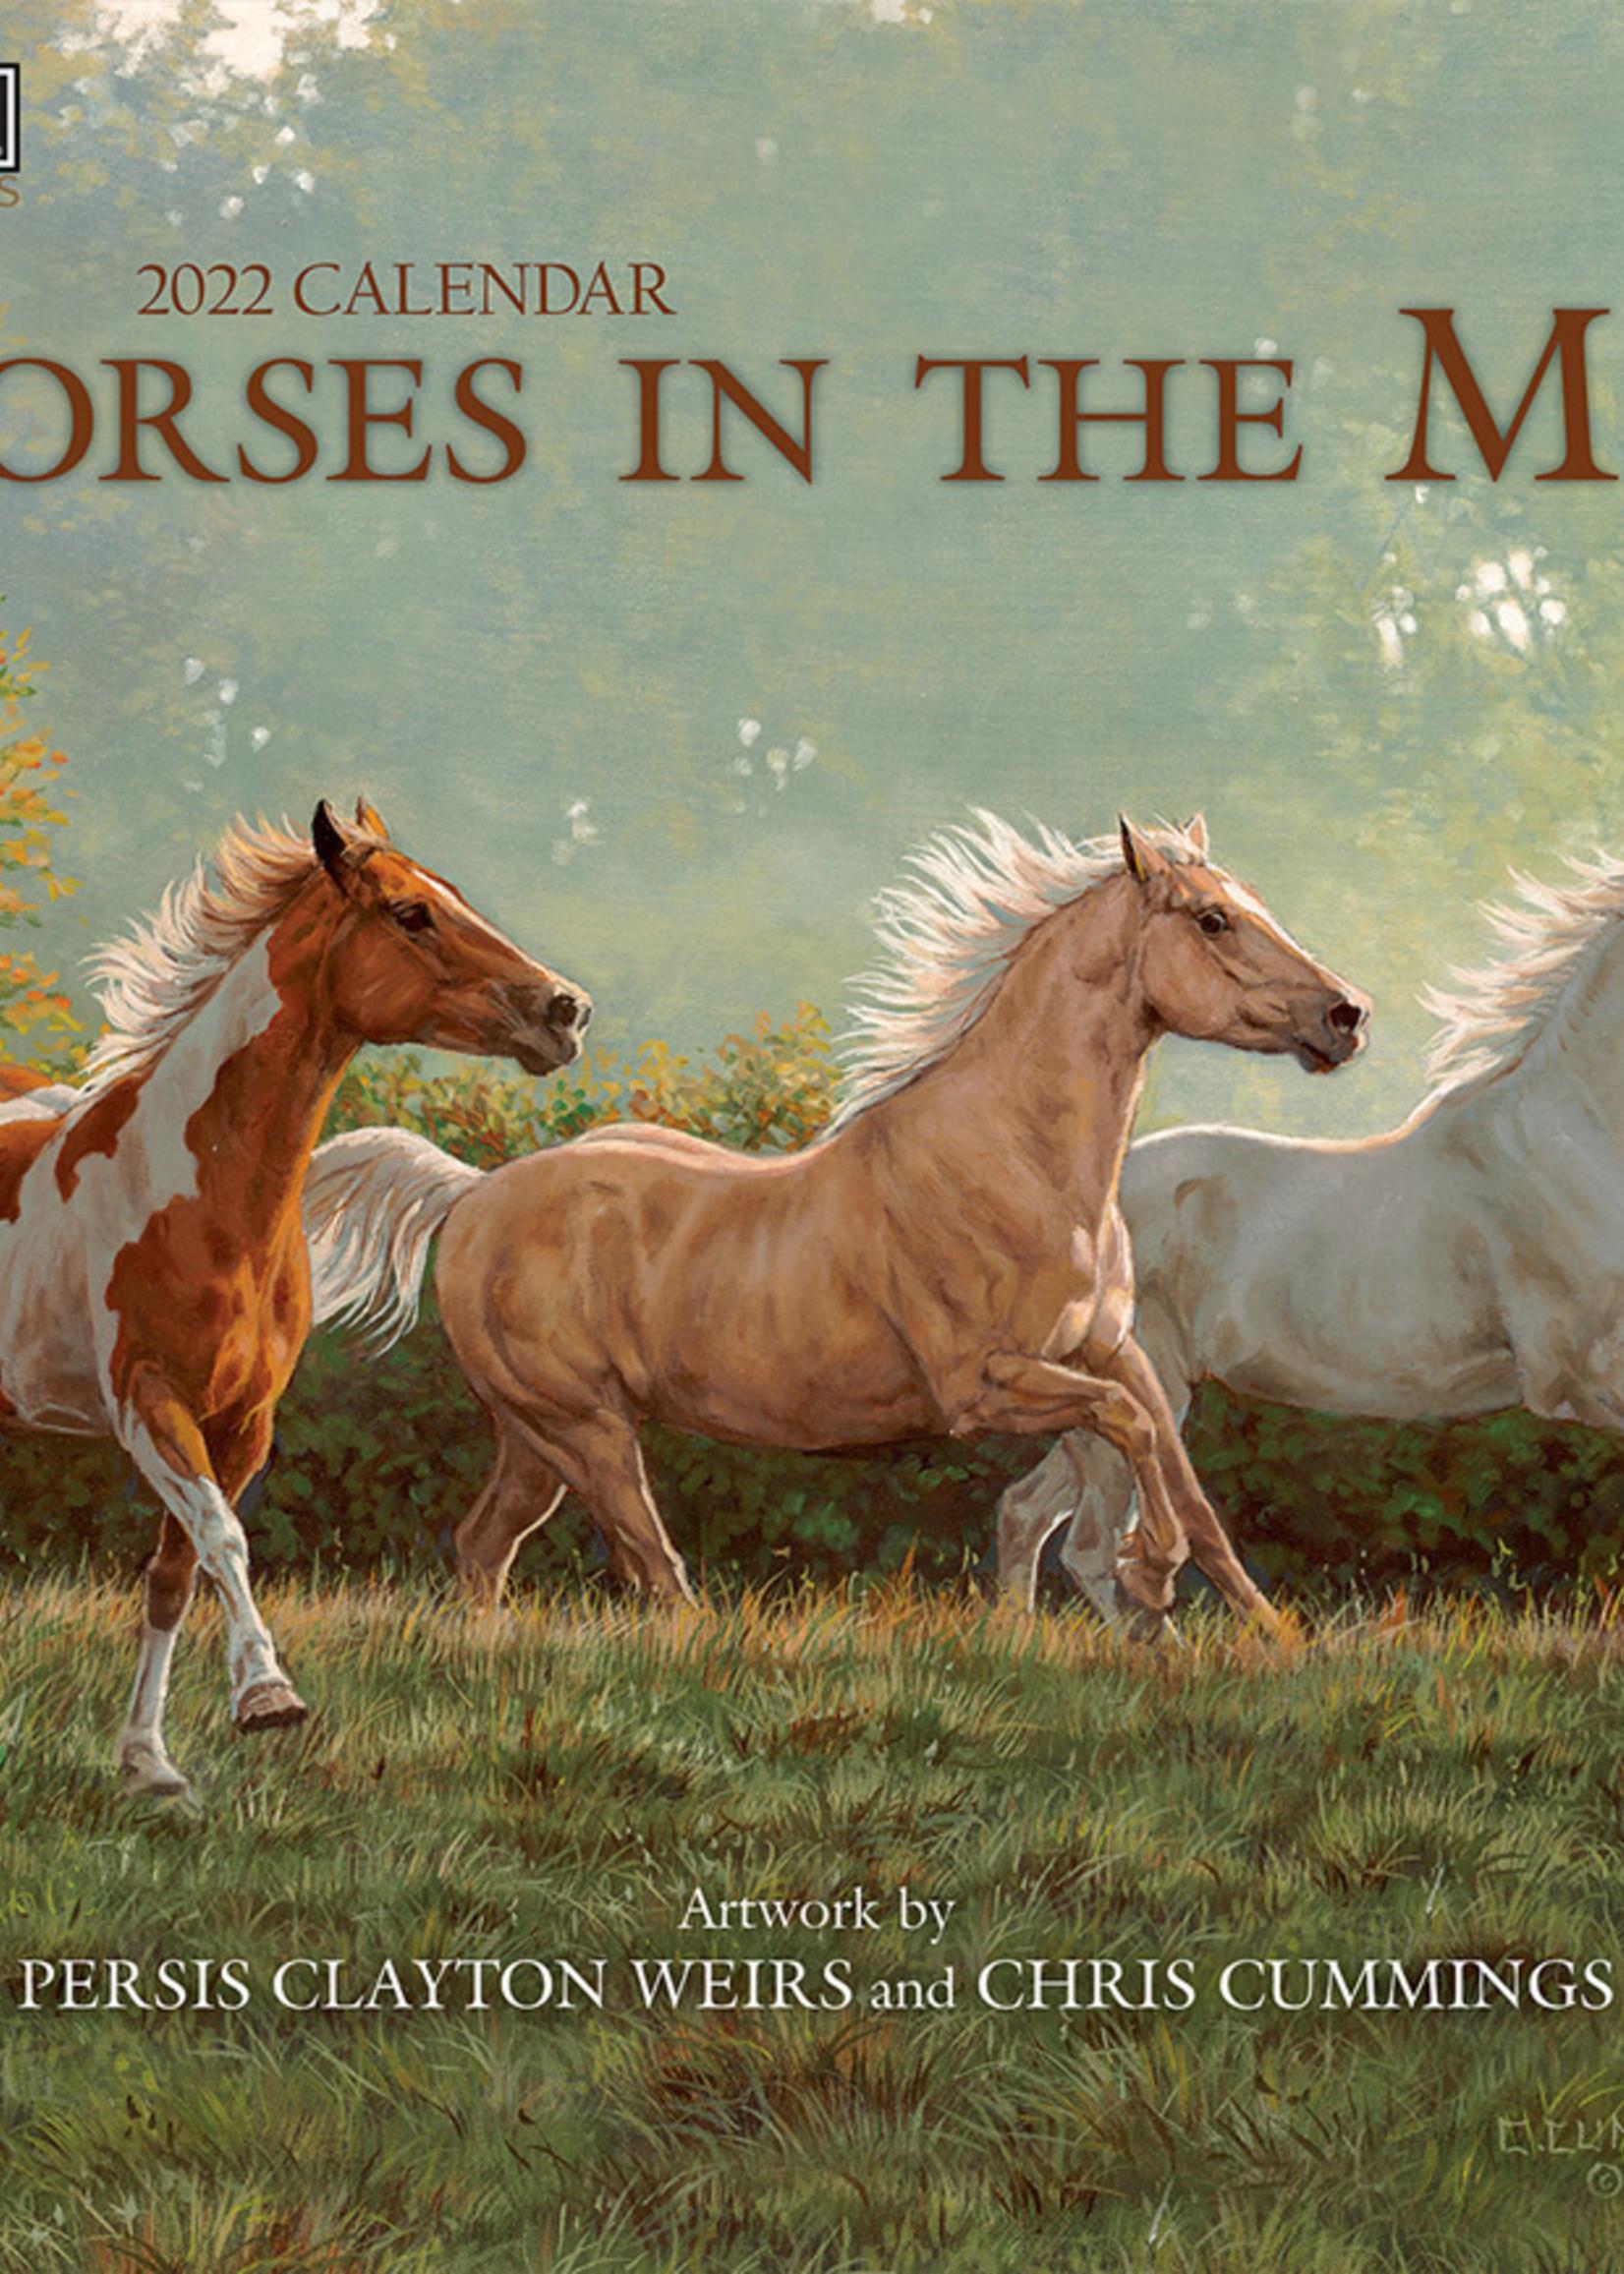 Horses in the Mist Calendar 2022